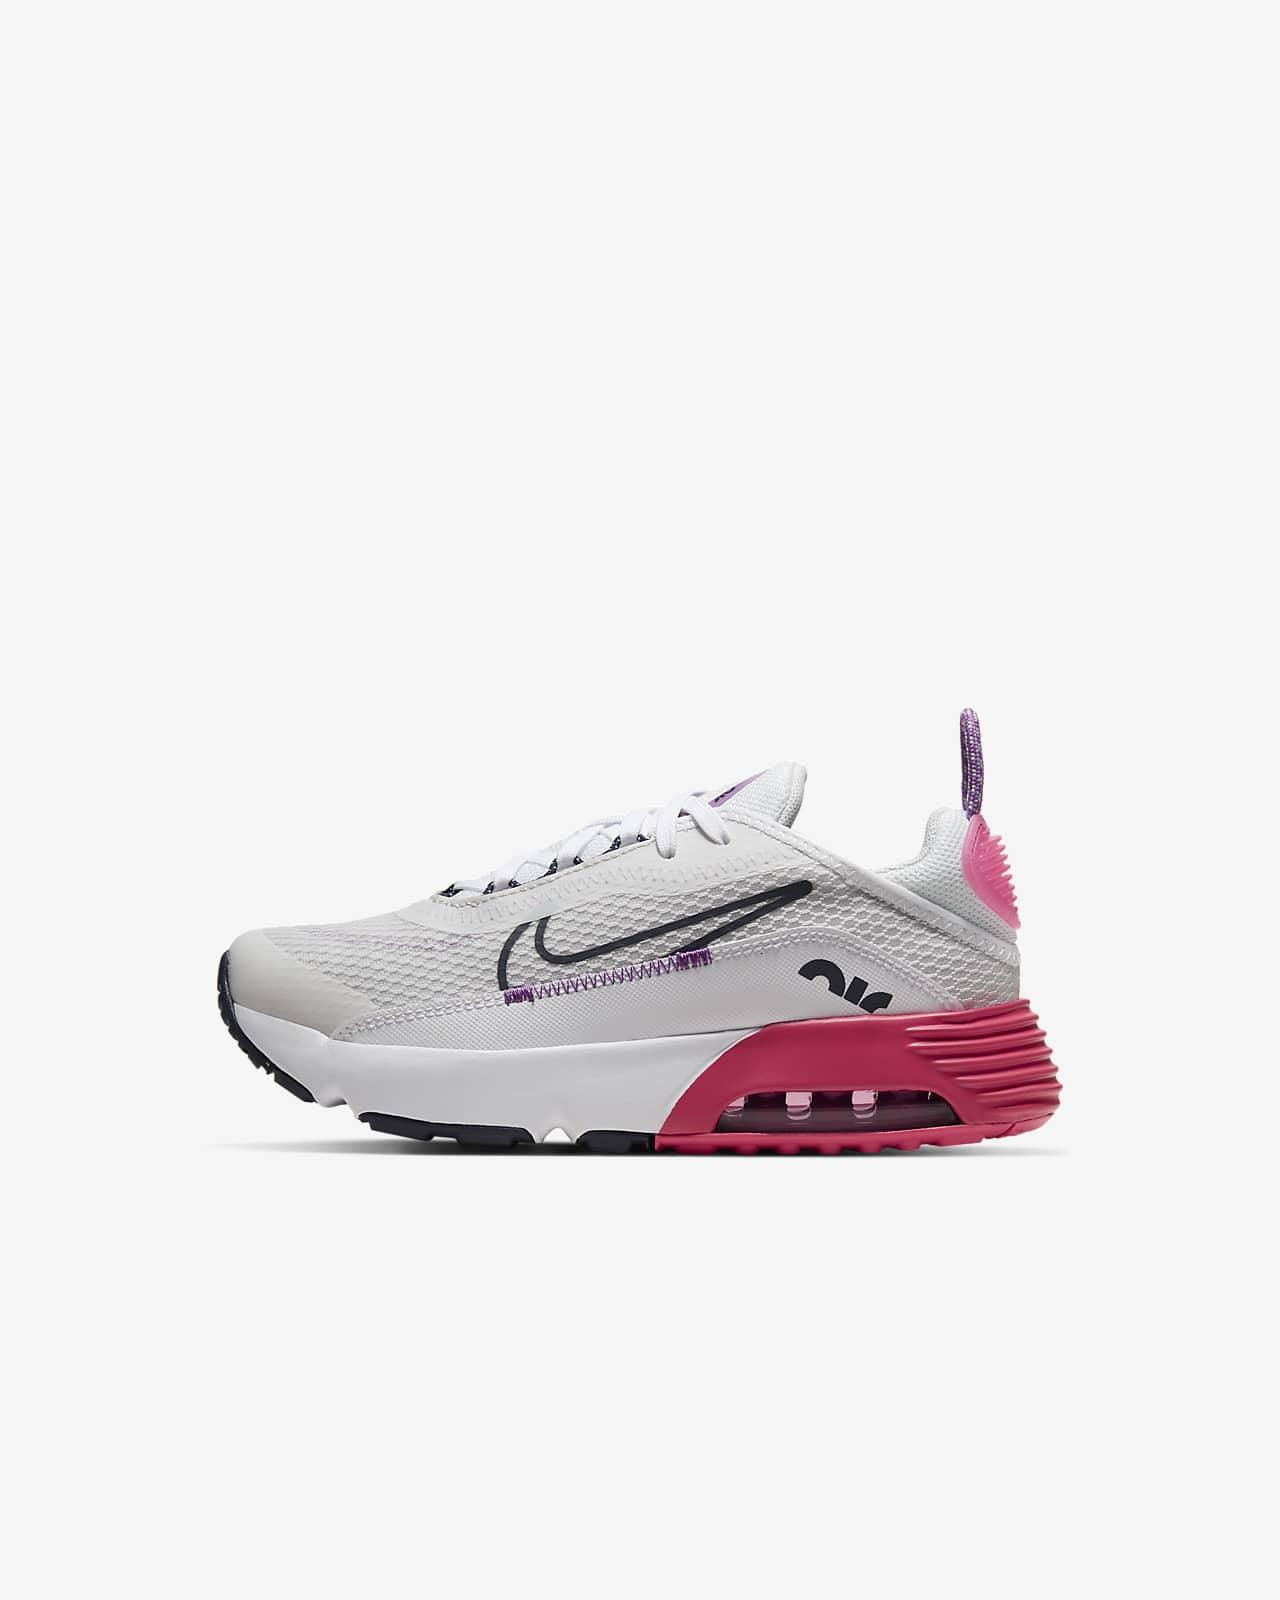 Bota Nike Air Max 2090 pro malé děti